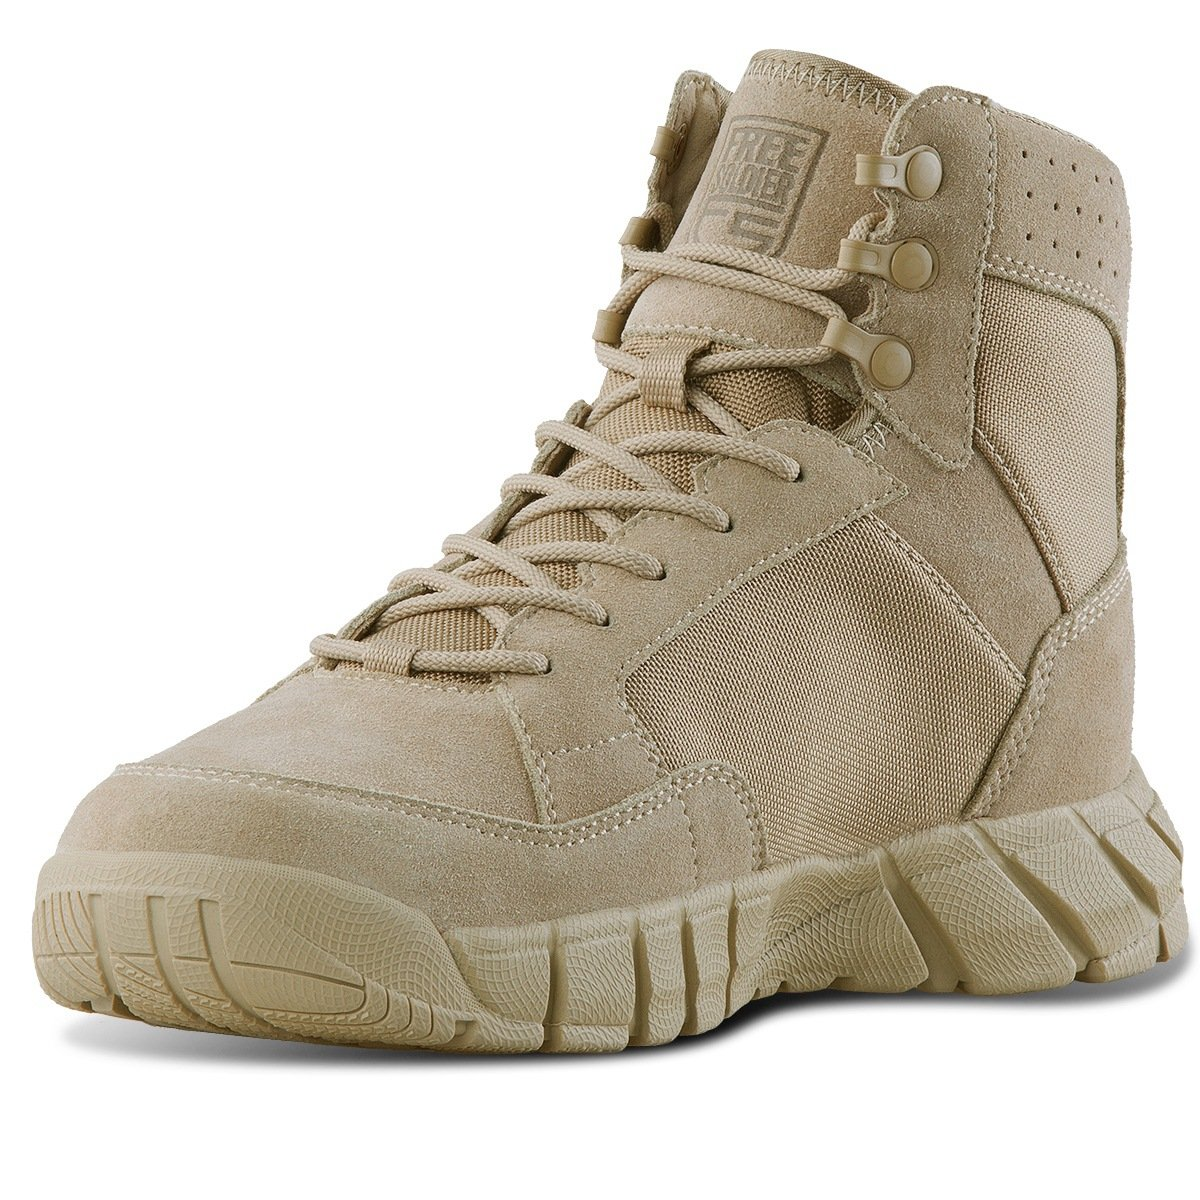 FREE SOLDIER Outdoor 2 nd Generation Herren Storm atmungsaktiv Langlebig Schnürschuhe Tactical Wandern Schuhe Military Army Combat Stiefel